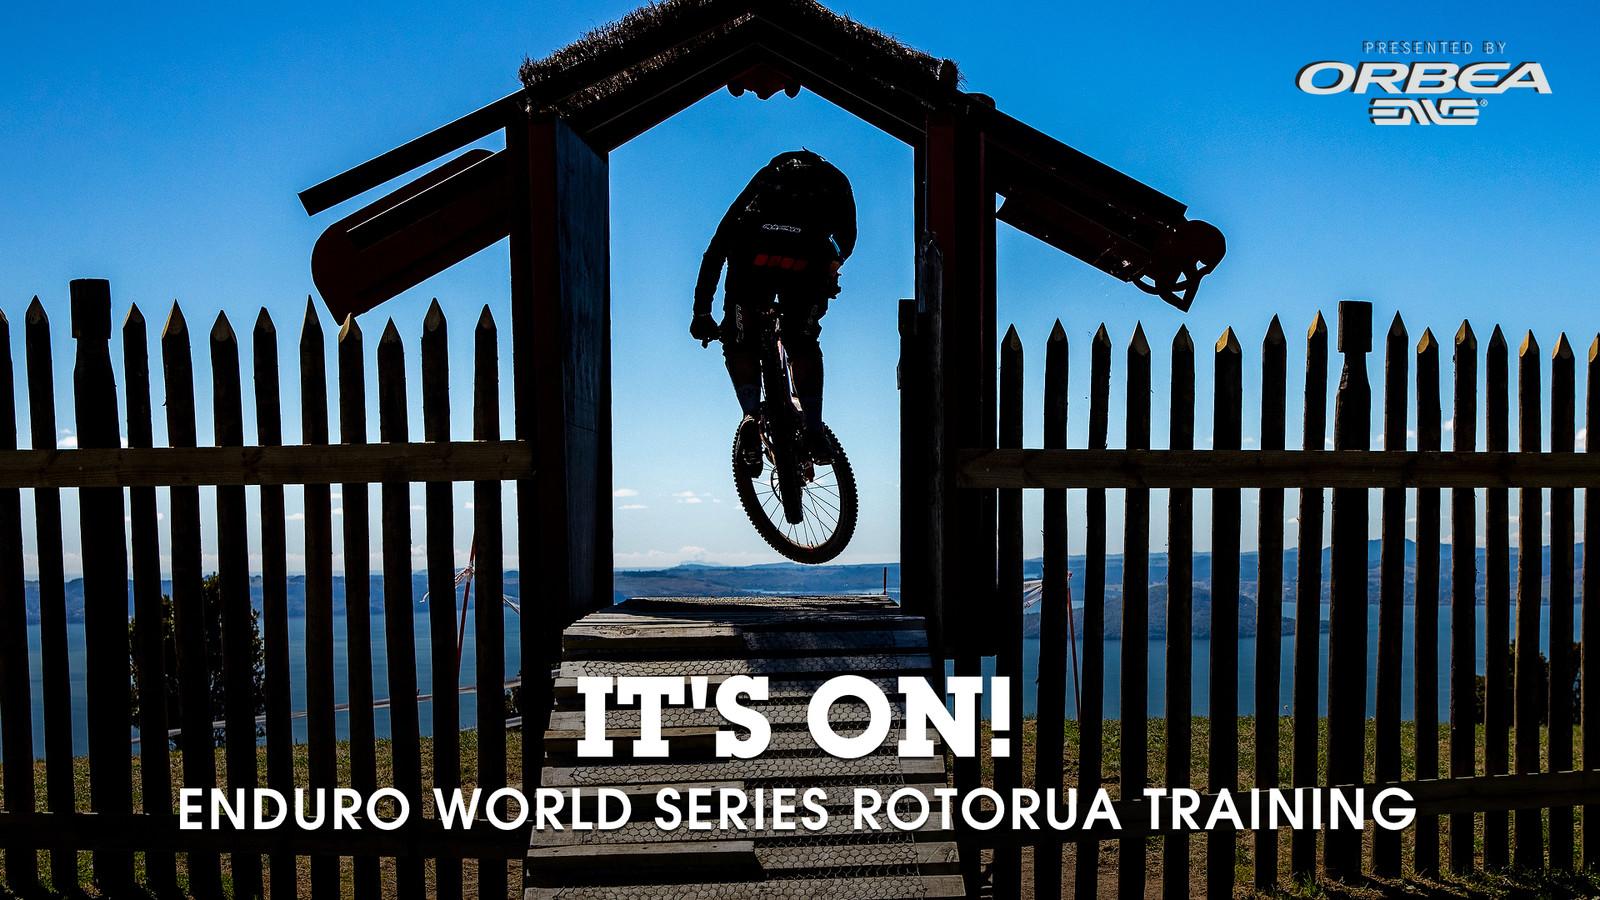 IT'S ON! 2019 Enduro World Series, Rotorua - 2019 Enduro World Series Crankworx Rotorua - Mountain Biking Pictures - Vital MTB